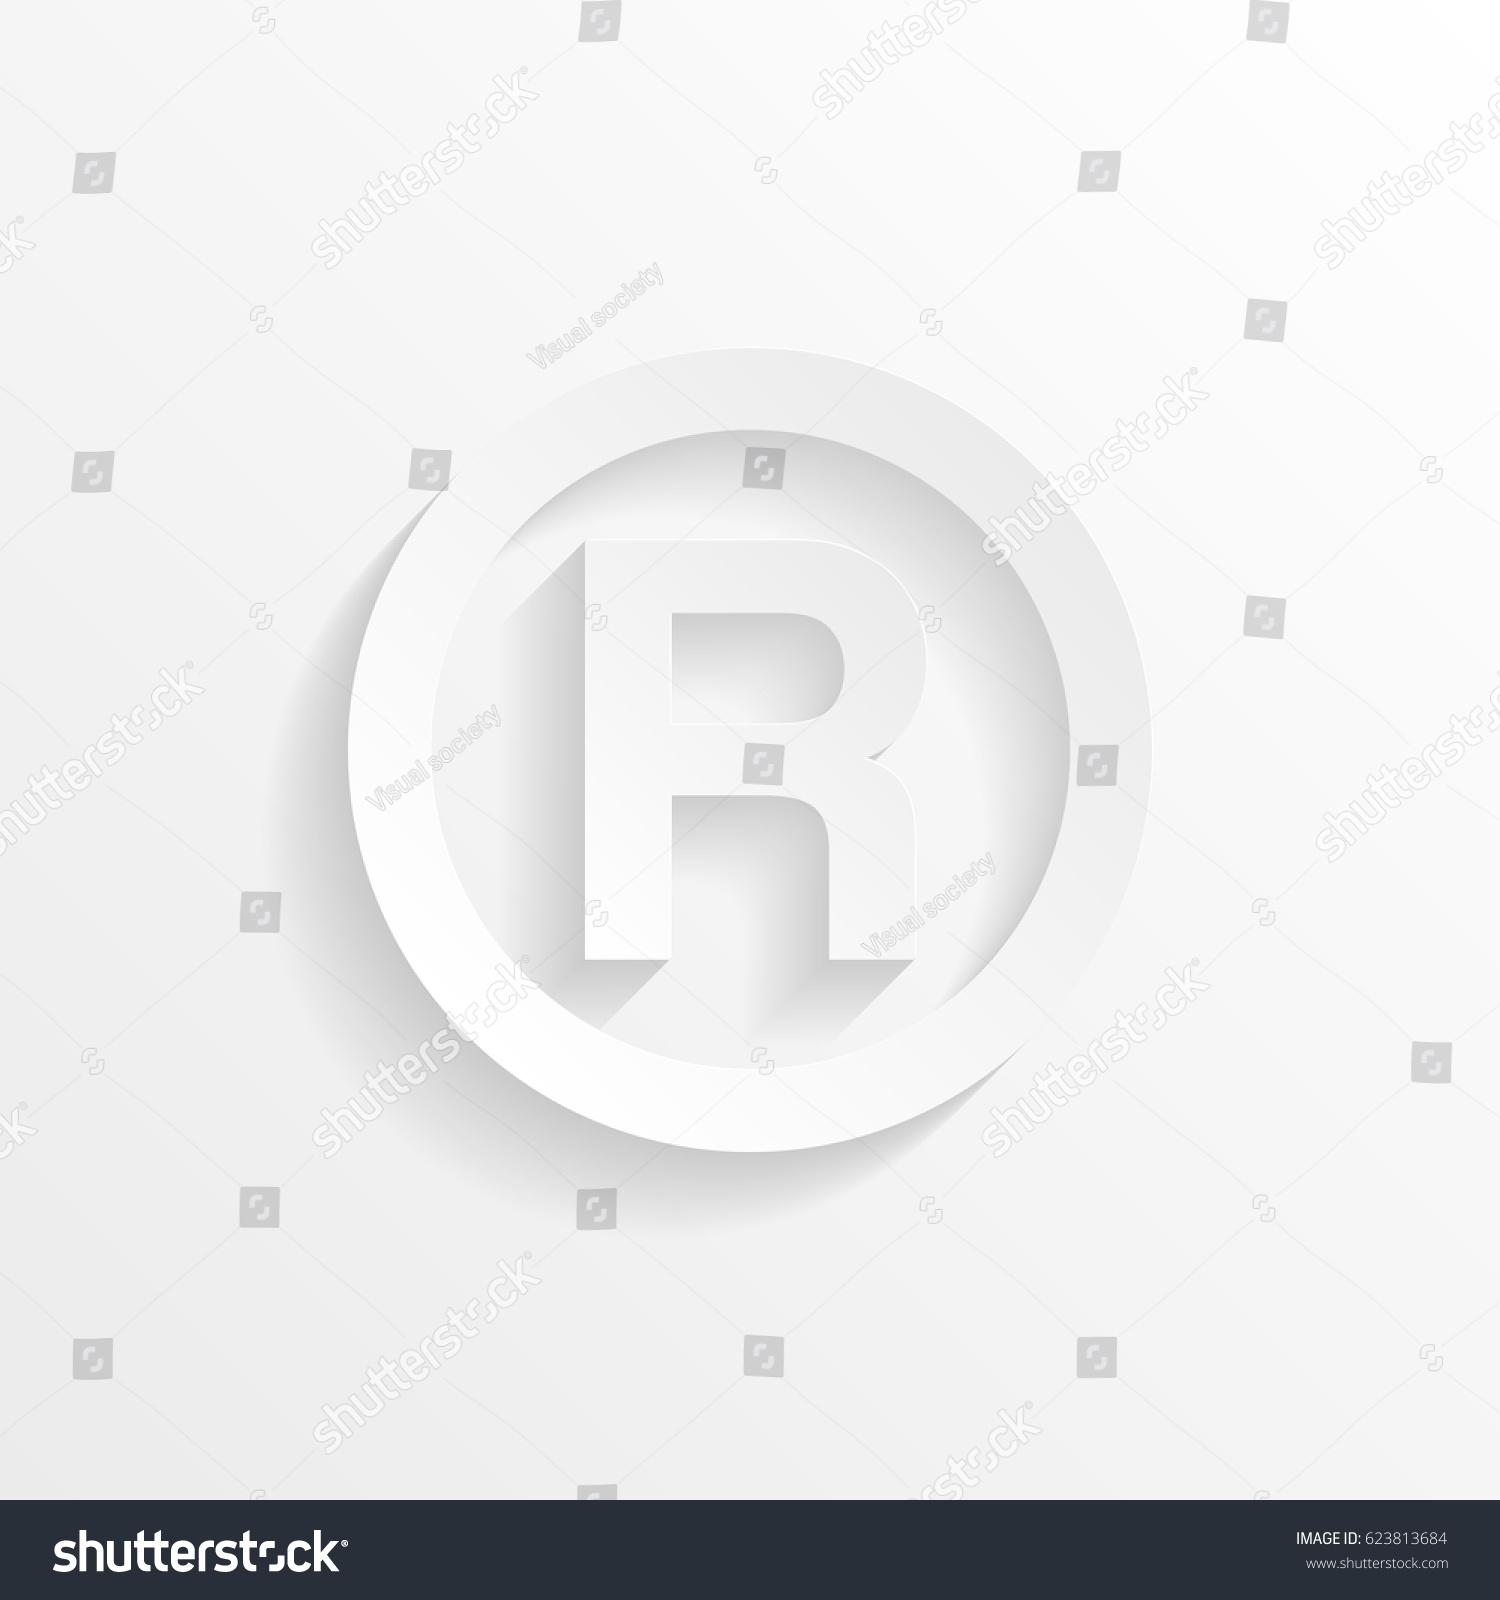 R Registered Trademark Symbol Shadow Cut Stock Vector Royalty Free